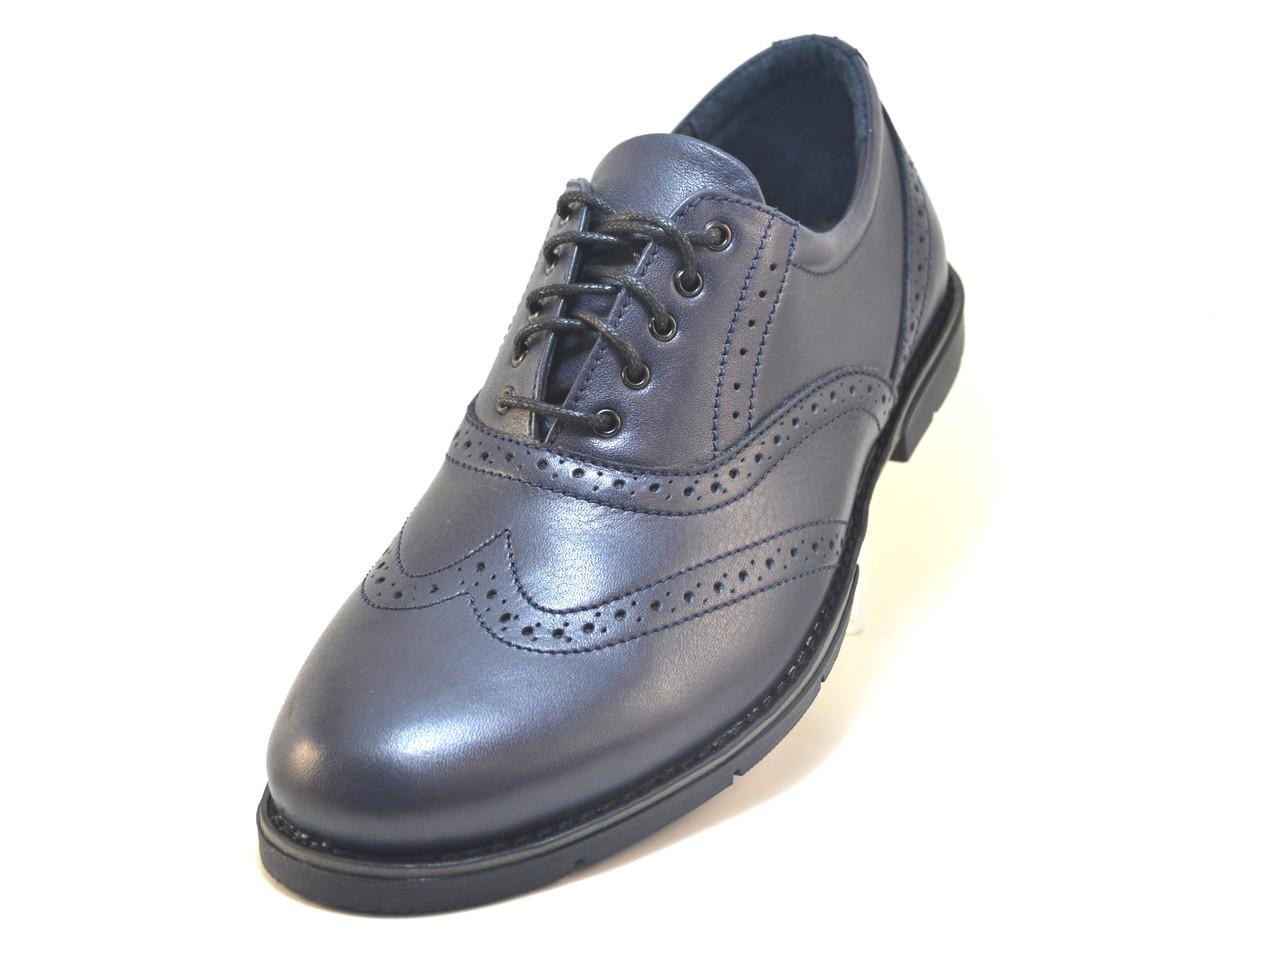 Туфли мужские кожаные броги Rosso Avangard Felicete Uomo Grey Pelle серые, фото 1